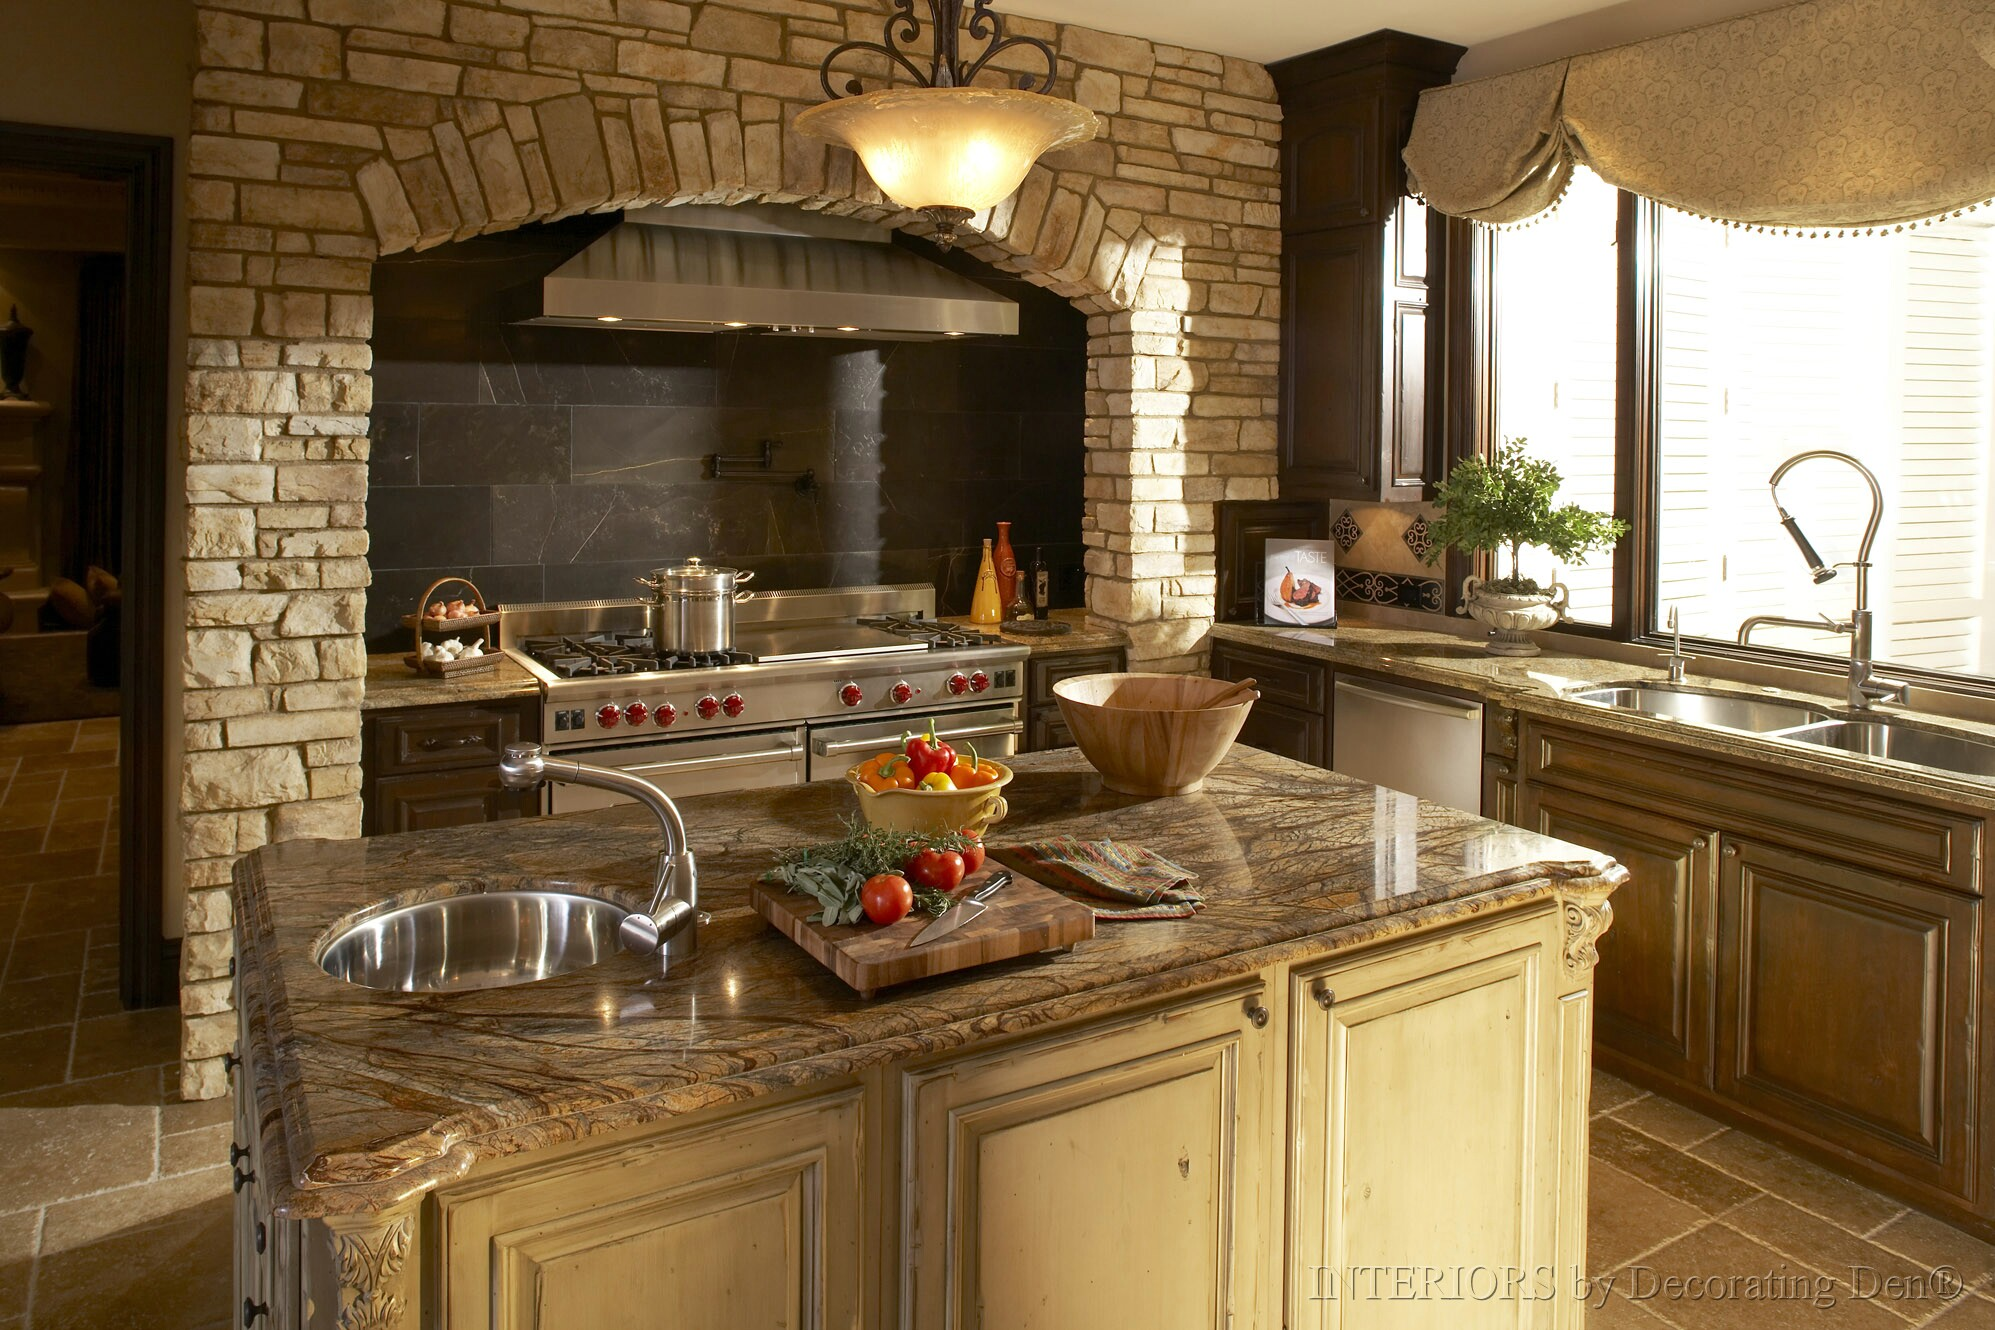 Important Kitchen Interior Design Components, Final